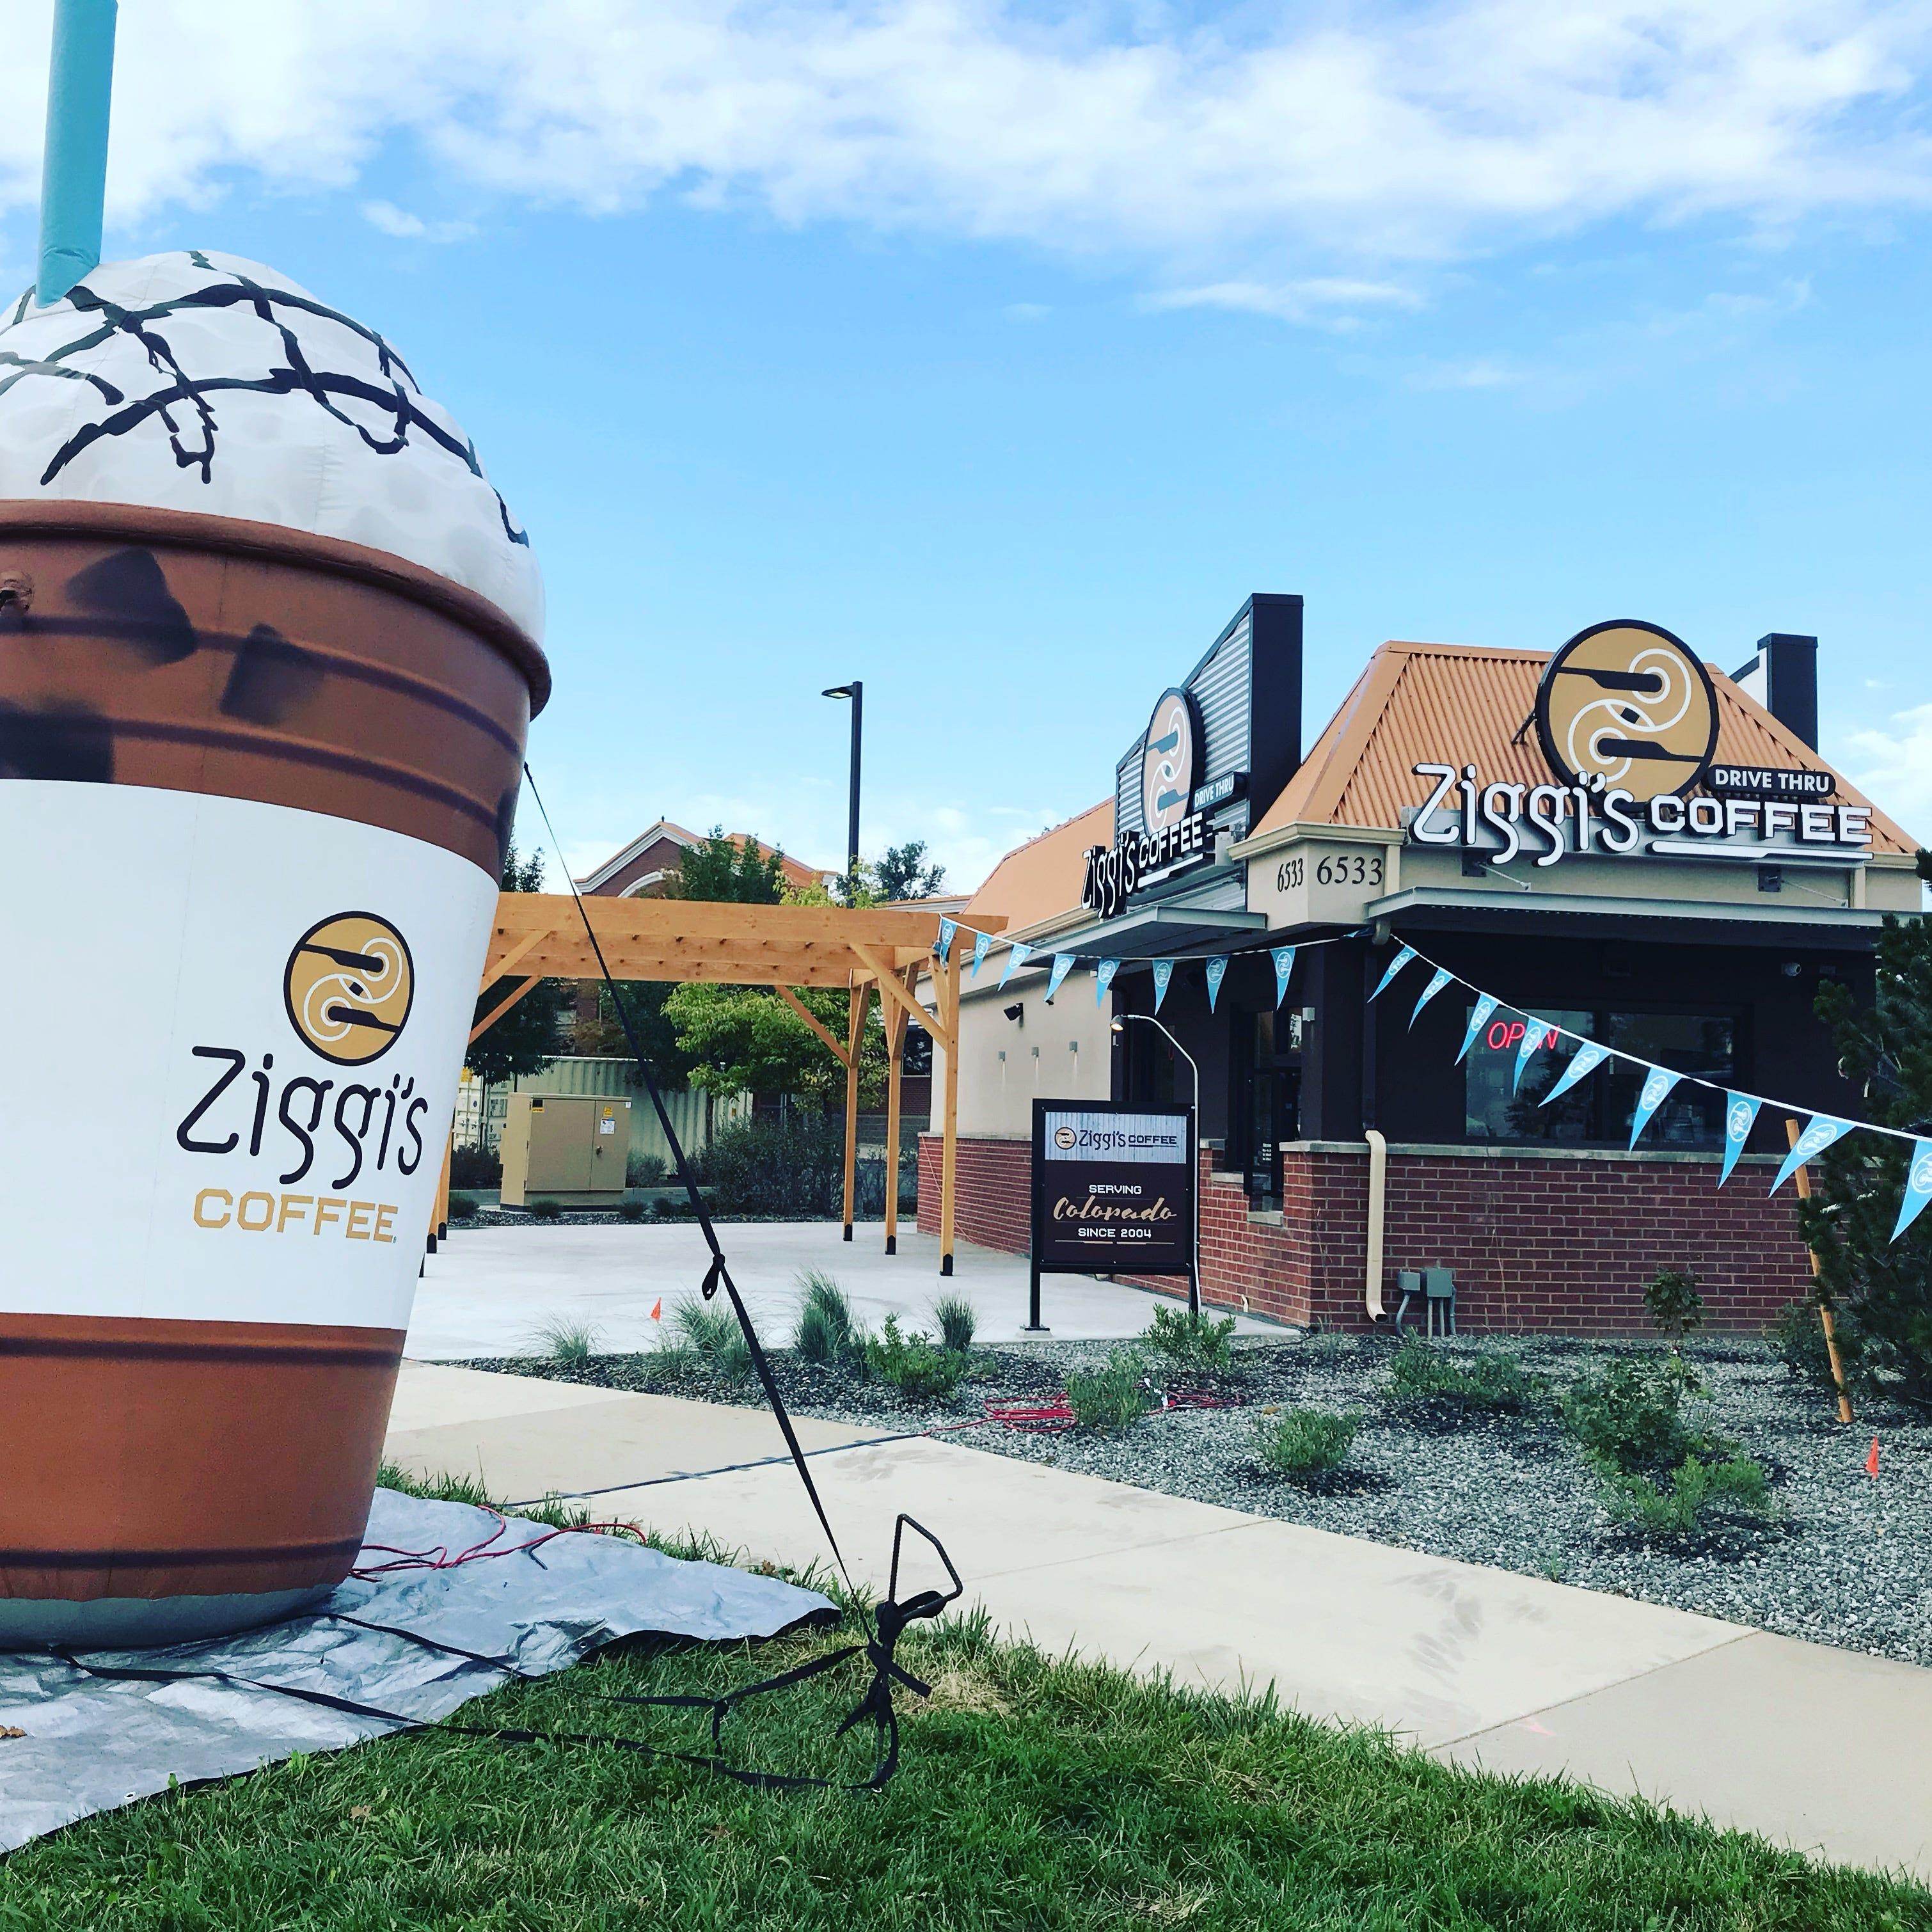 Windsor getting a Ziggi's drive-through coffee stop